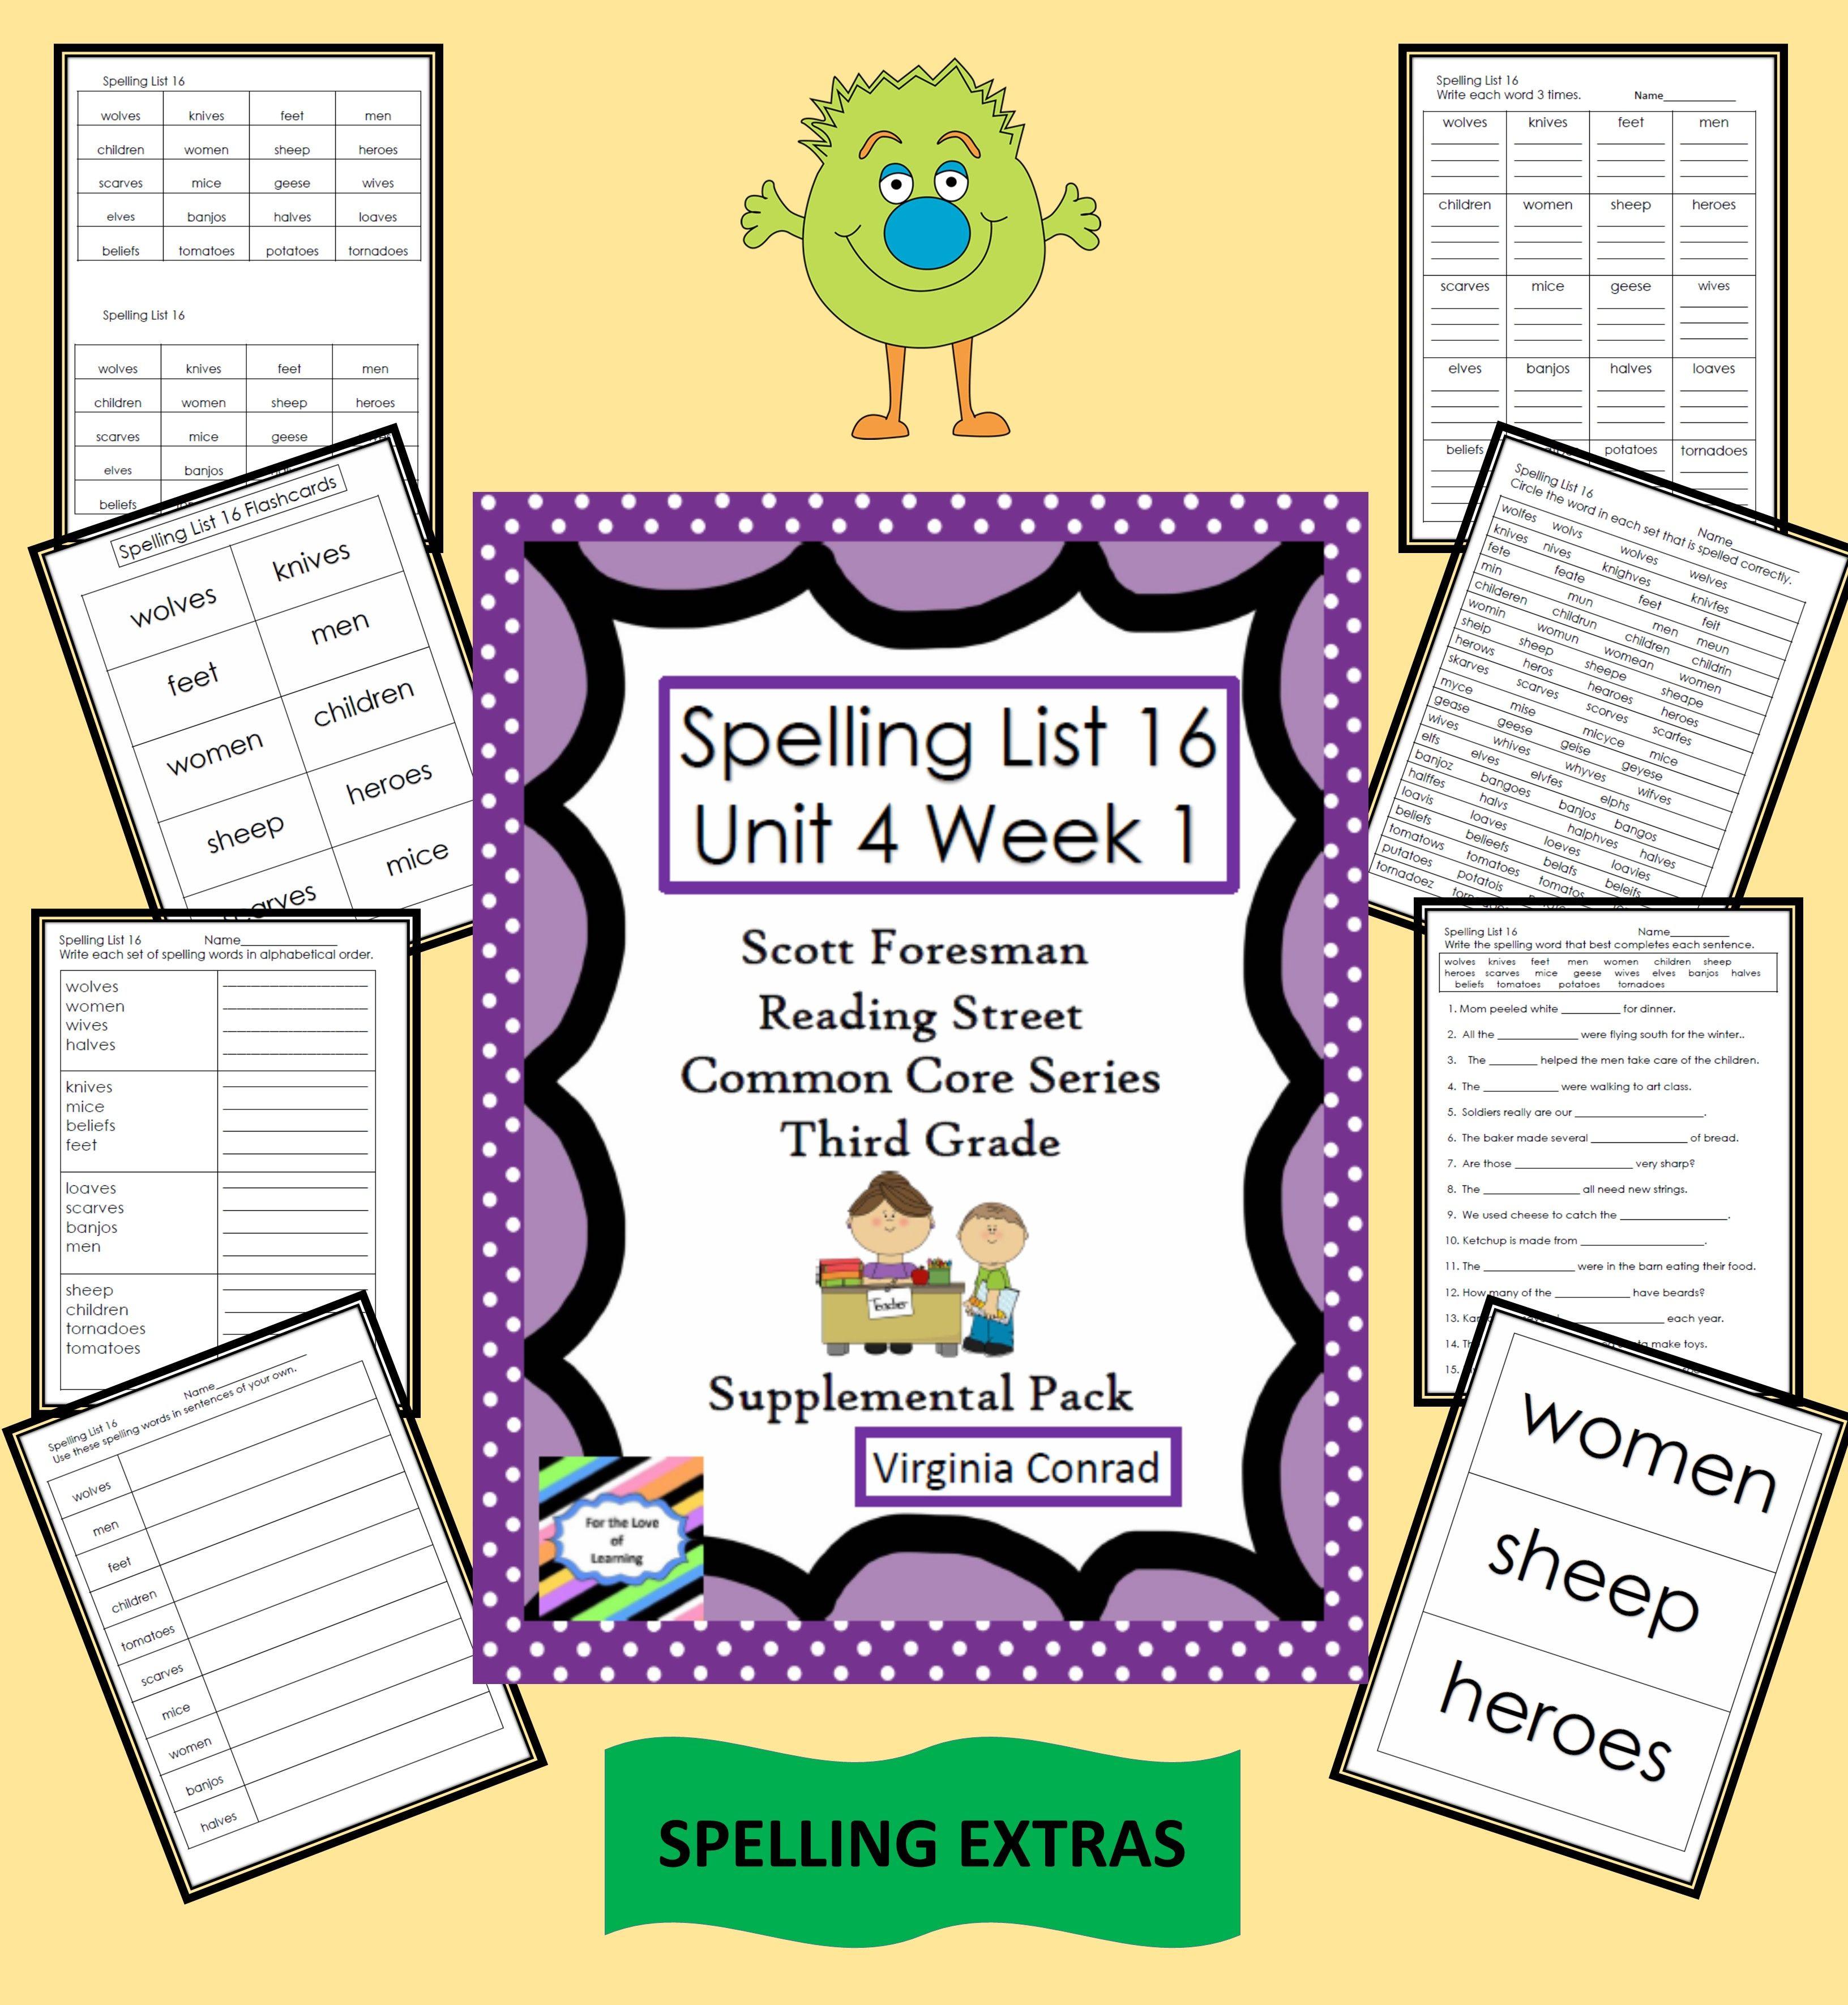 Supplemental Materials For Spelling List 16 Unit 4 Week 1